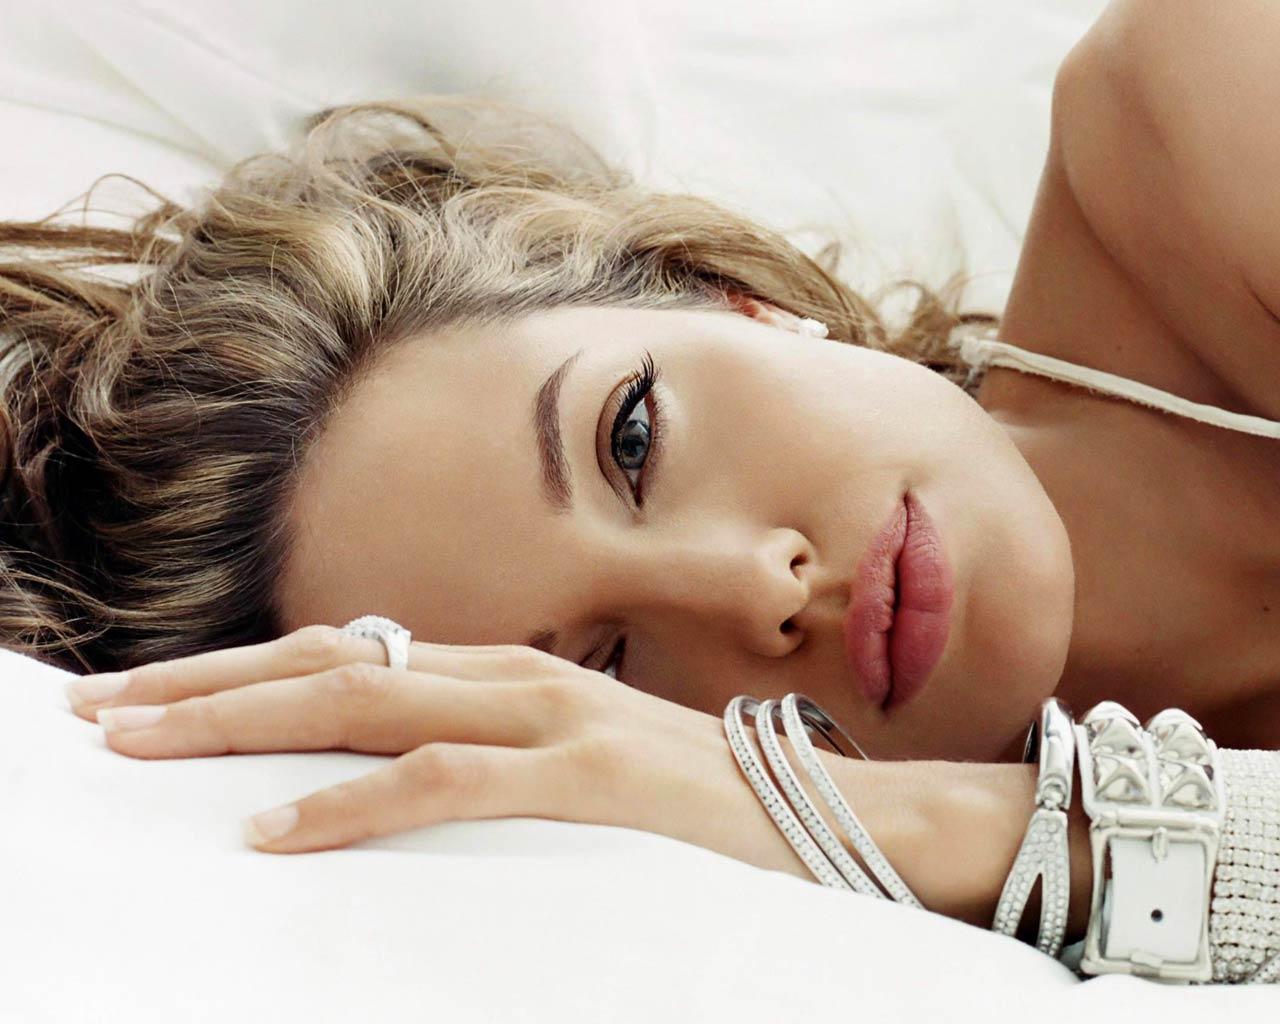 http://3.bp.blogspot.com/-rEDY7yrlyew/T65xggmTY0I/AAAAAAAAFb8/-Cx35z1dkS0/s1600/angelina-jolie-7.jpg